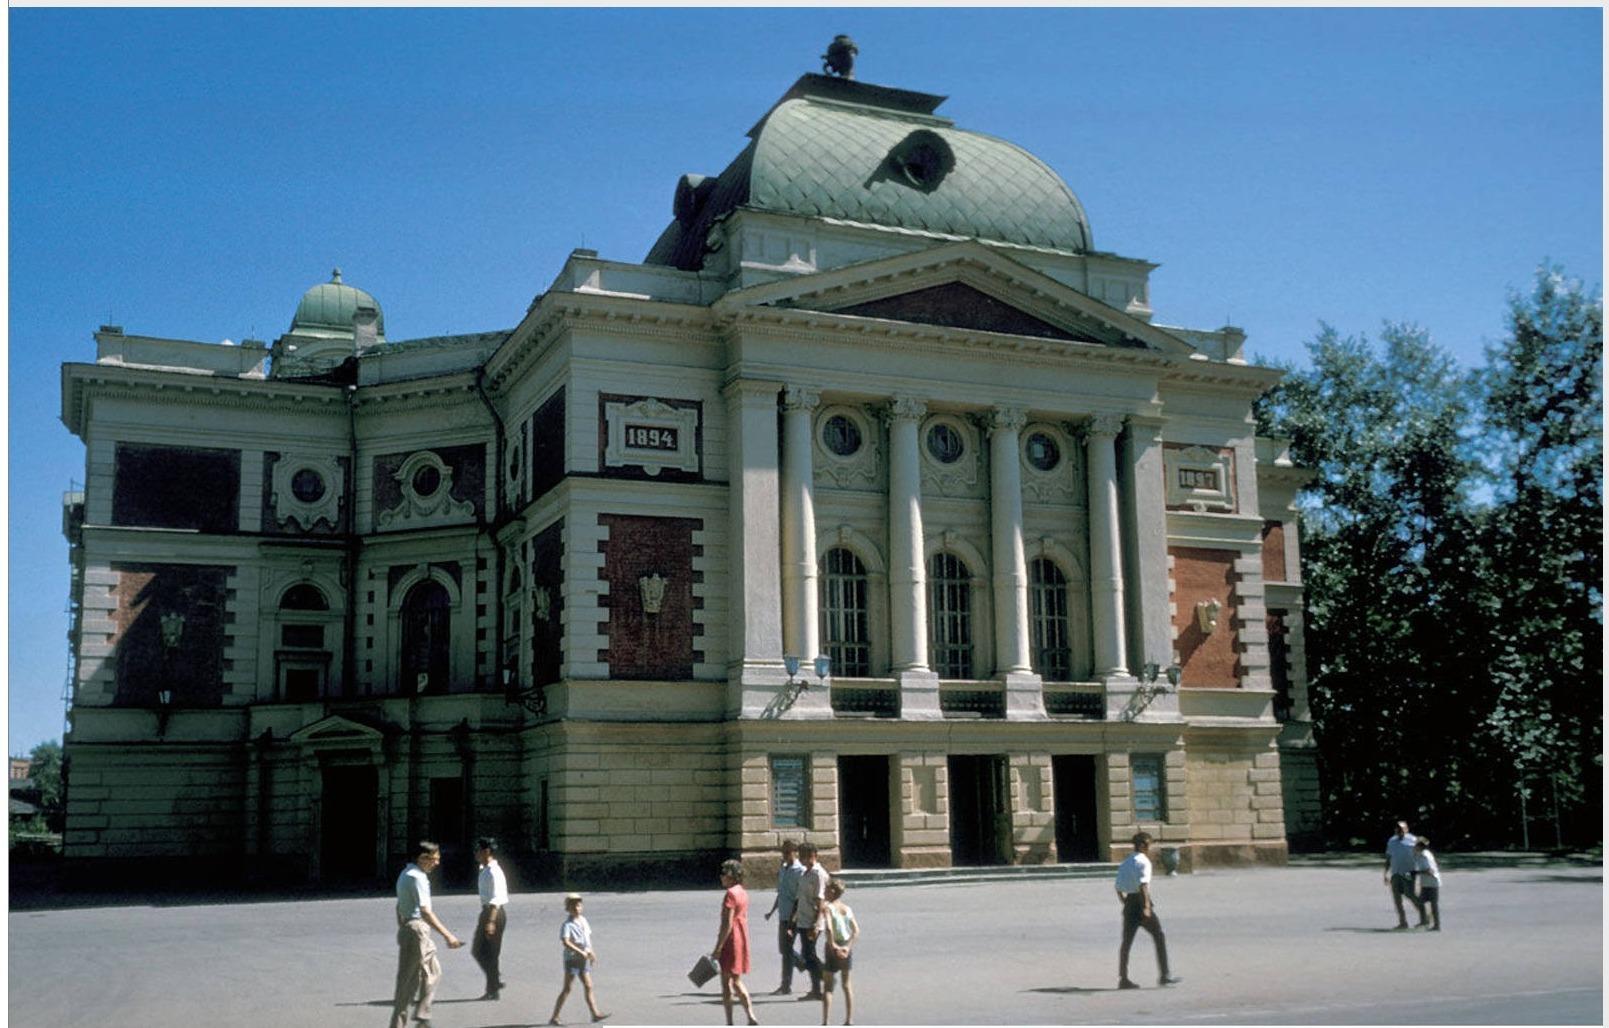 Улица Карла Маркса, 14. Драматический театр имени Н. П. Охлопкова